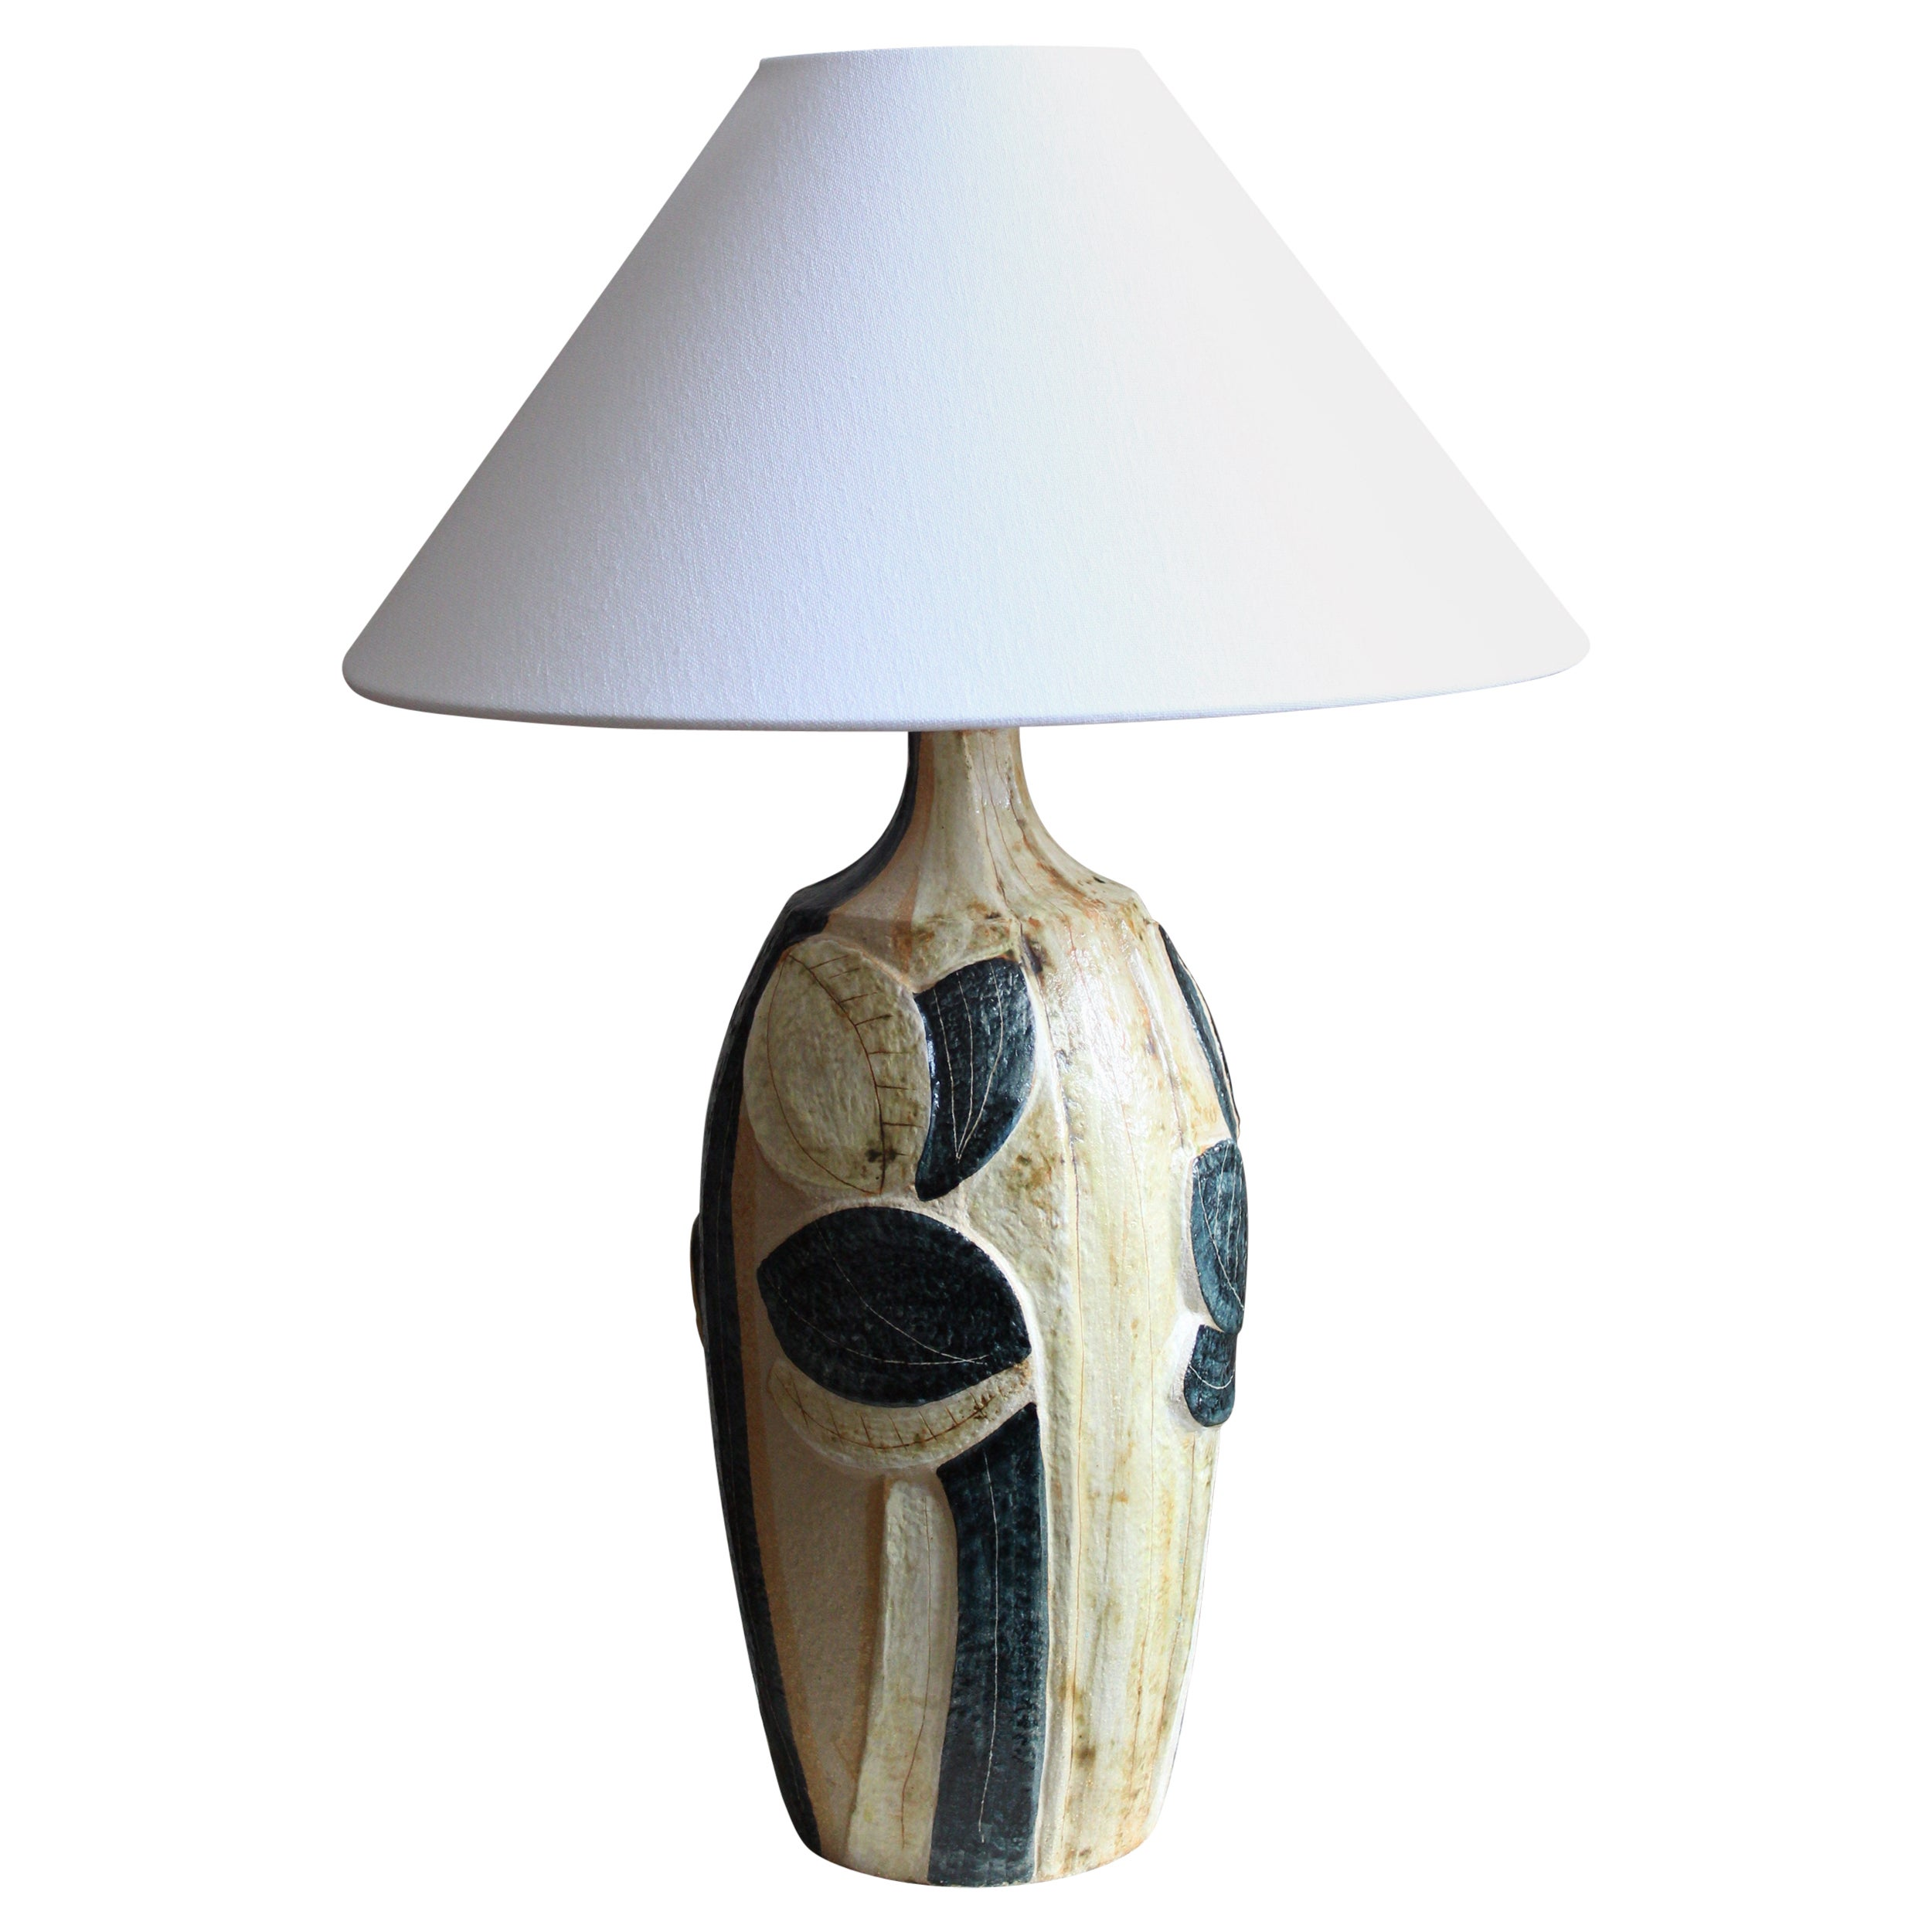 Noomi Backhausen, Large Table Lamp, Stoneware, Søholm, Bornholm, Denmark, 1960s